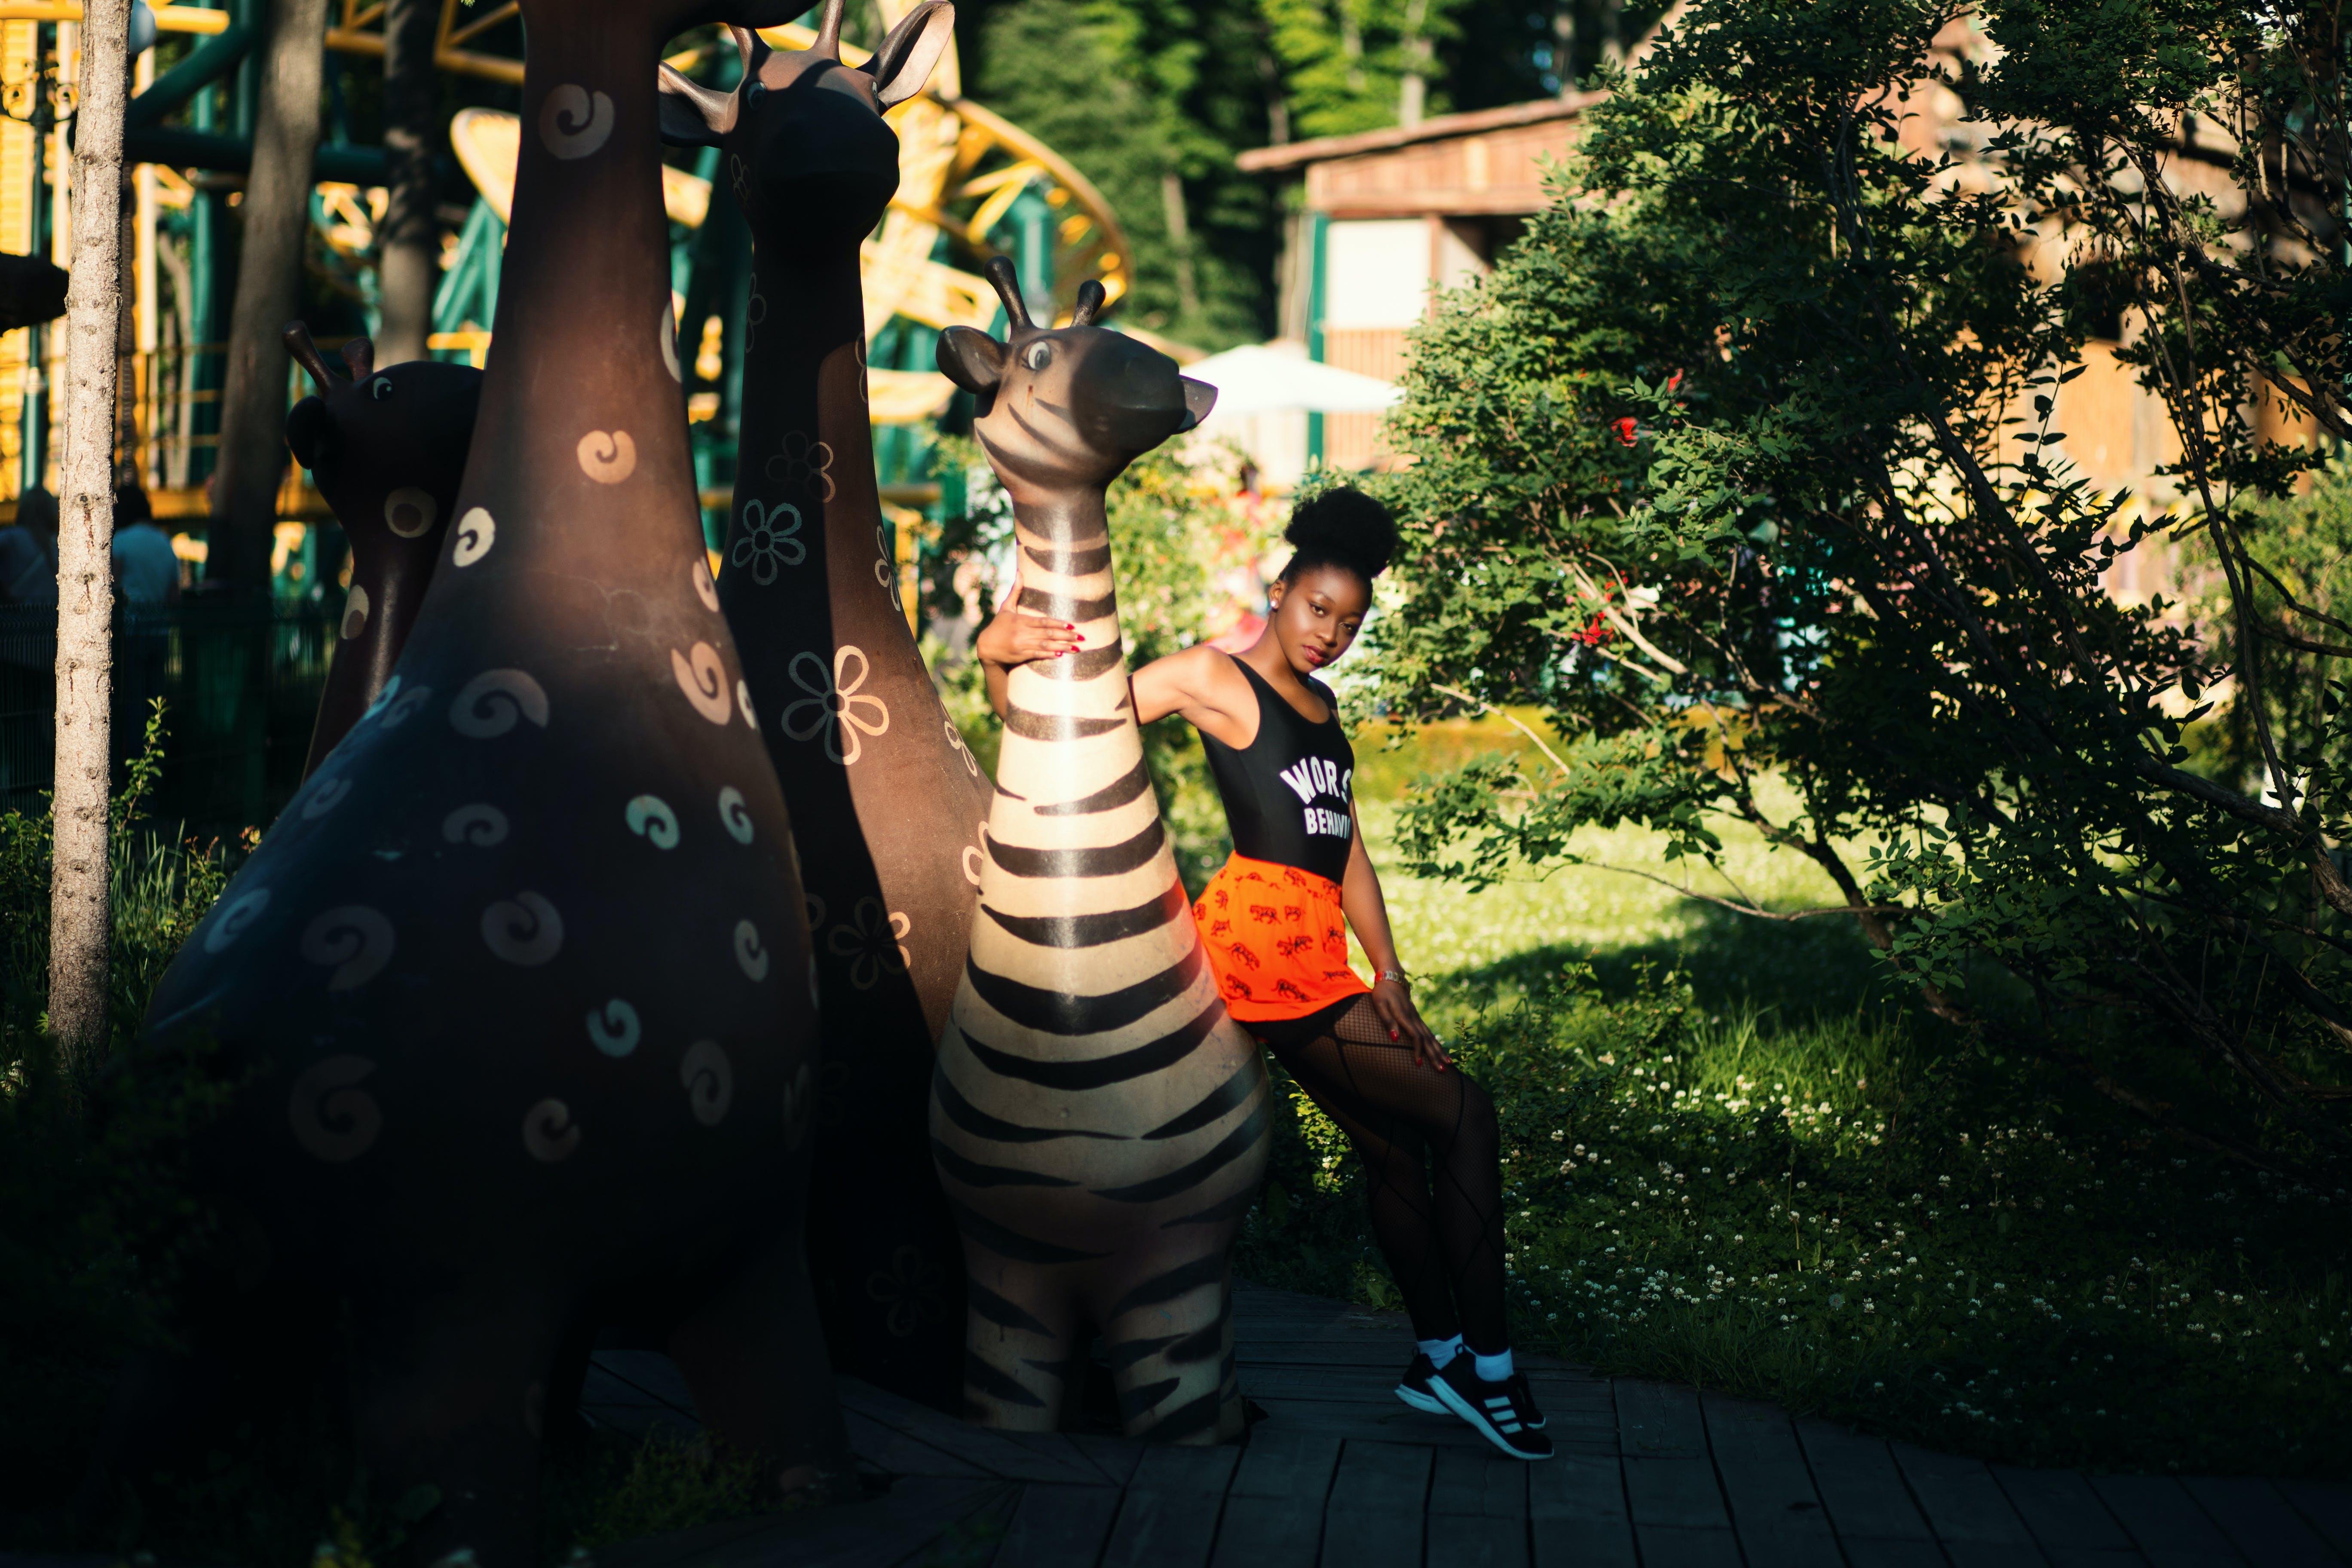 Photo of Woman Sitting on Zebra Statue